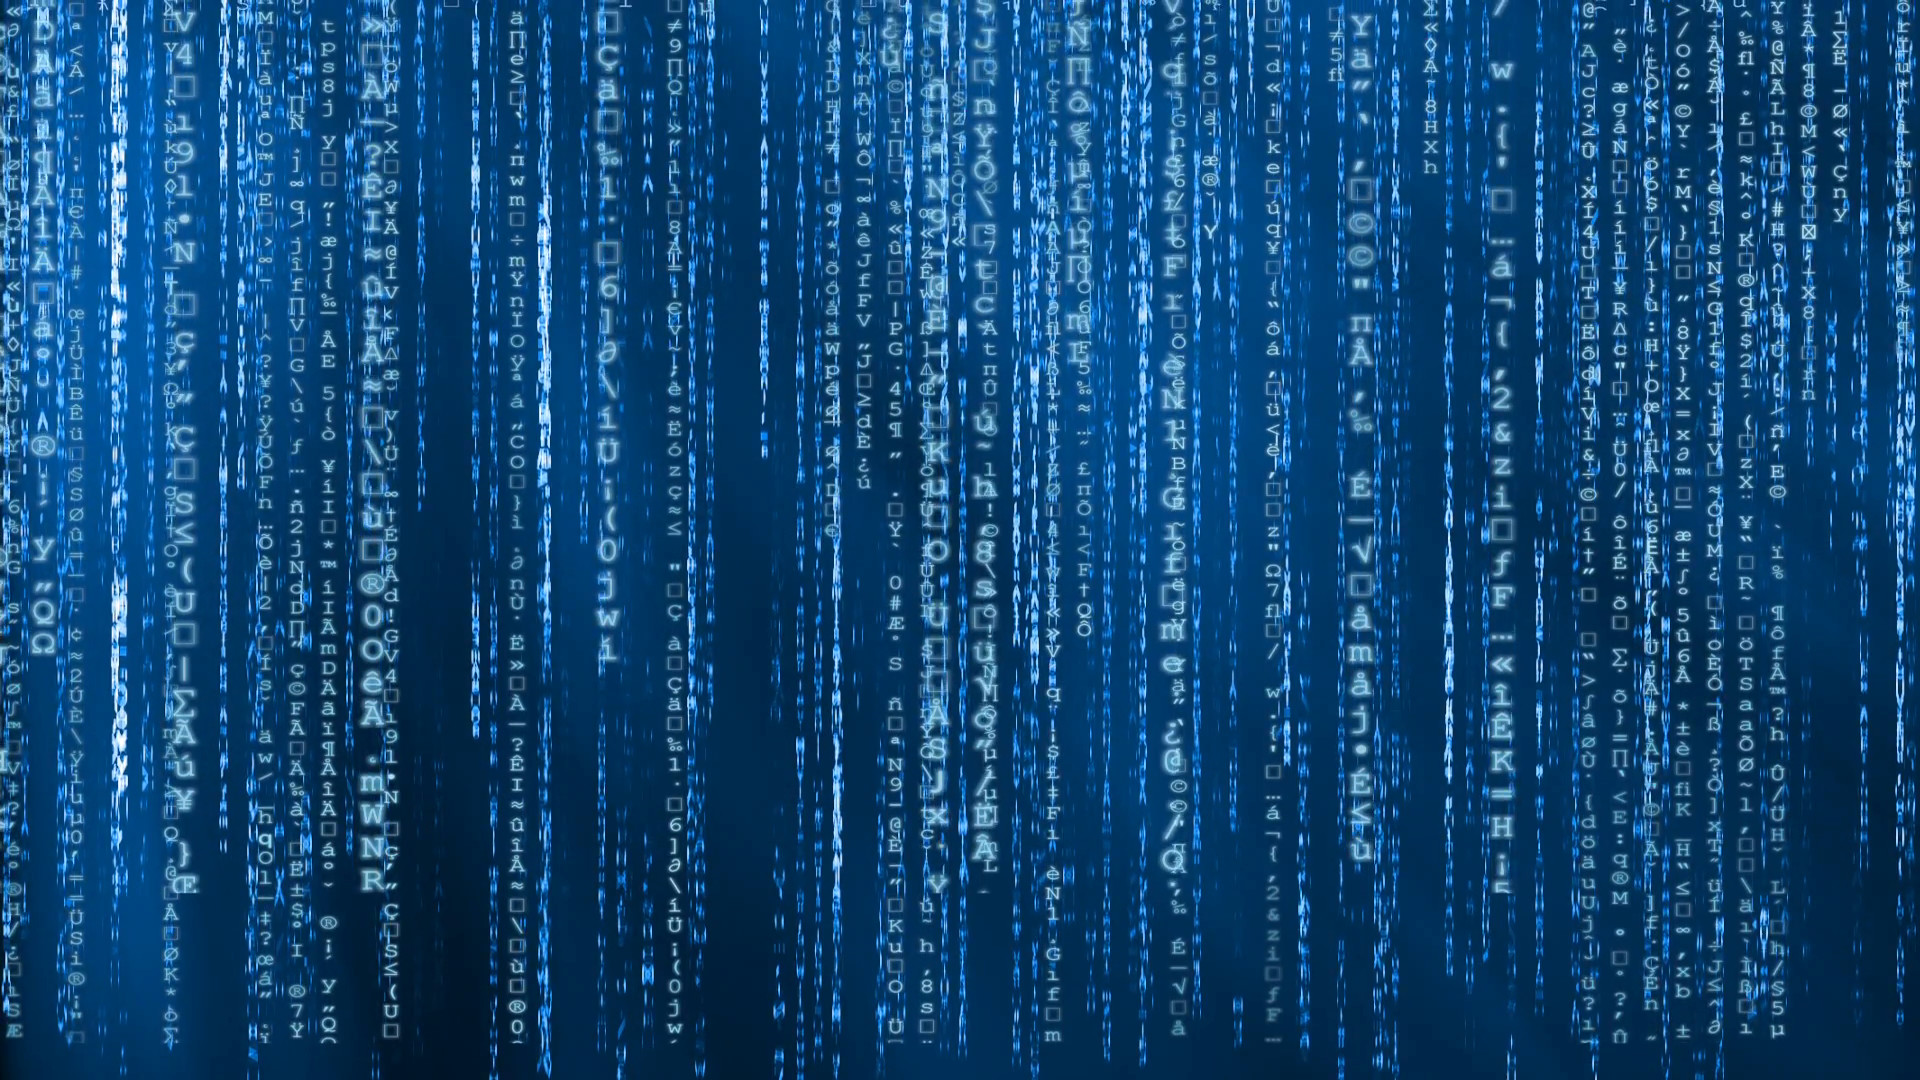 картинки компьютерная матрица